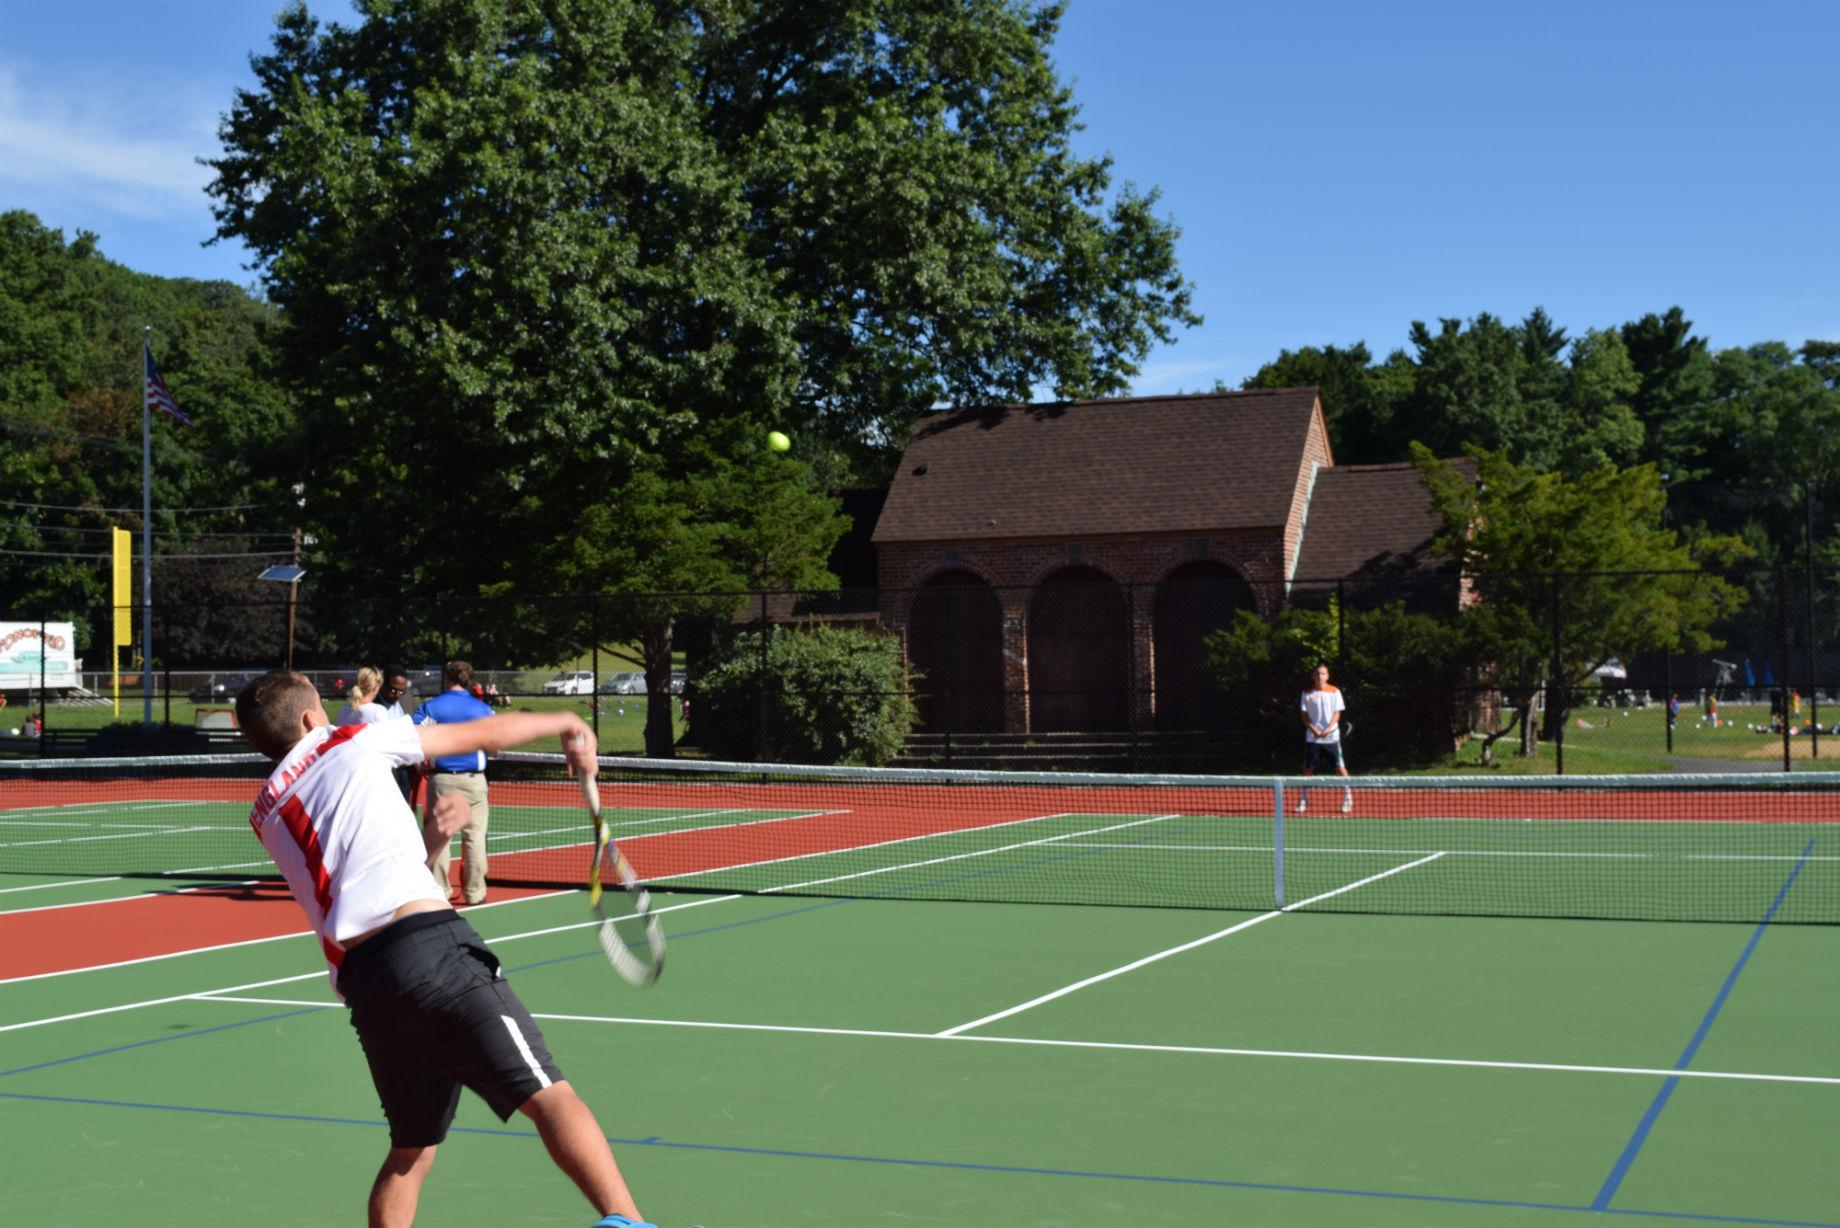 2f63b4cd1649e47c8ad2_tennis.opening3.jpg